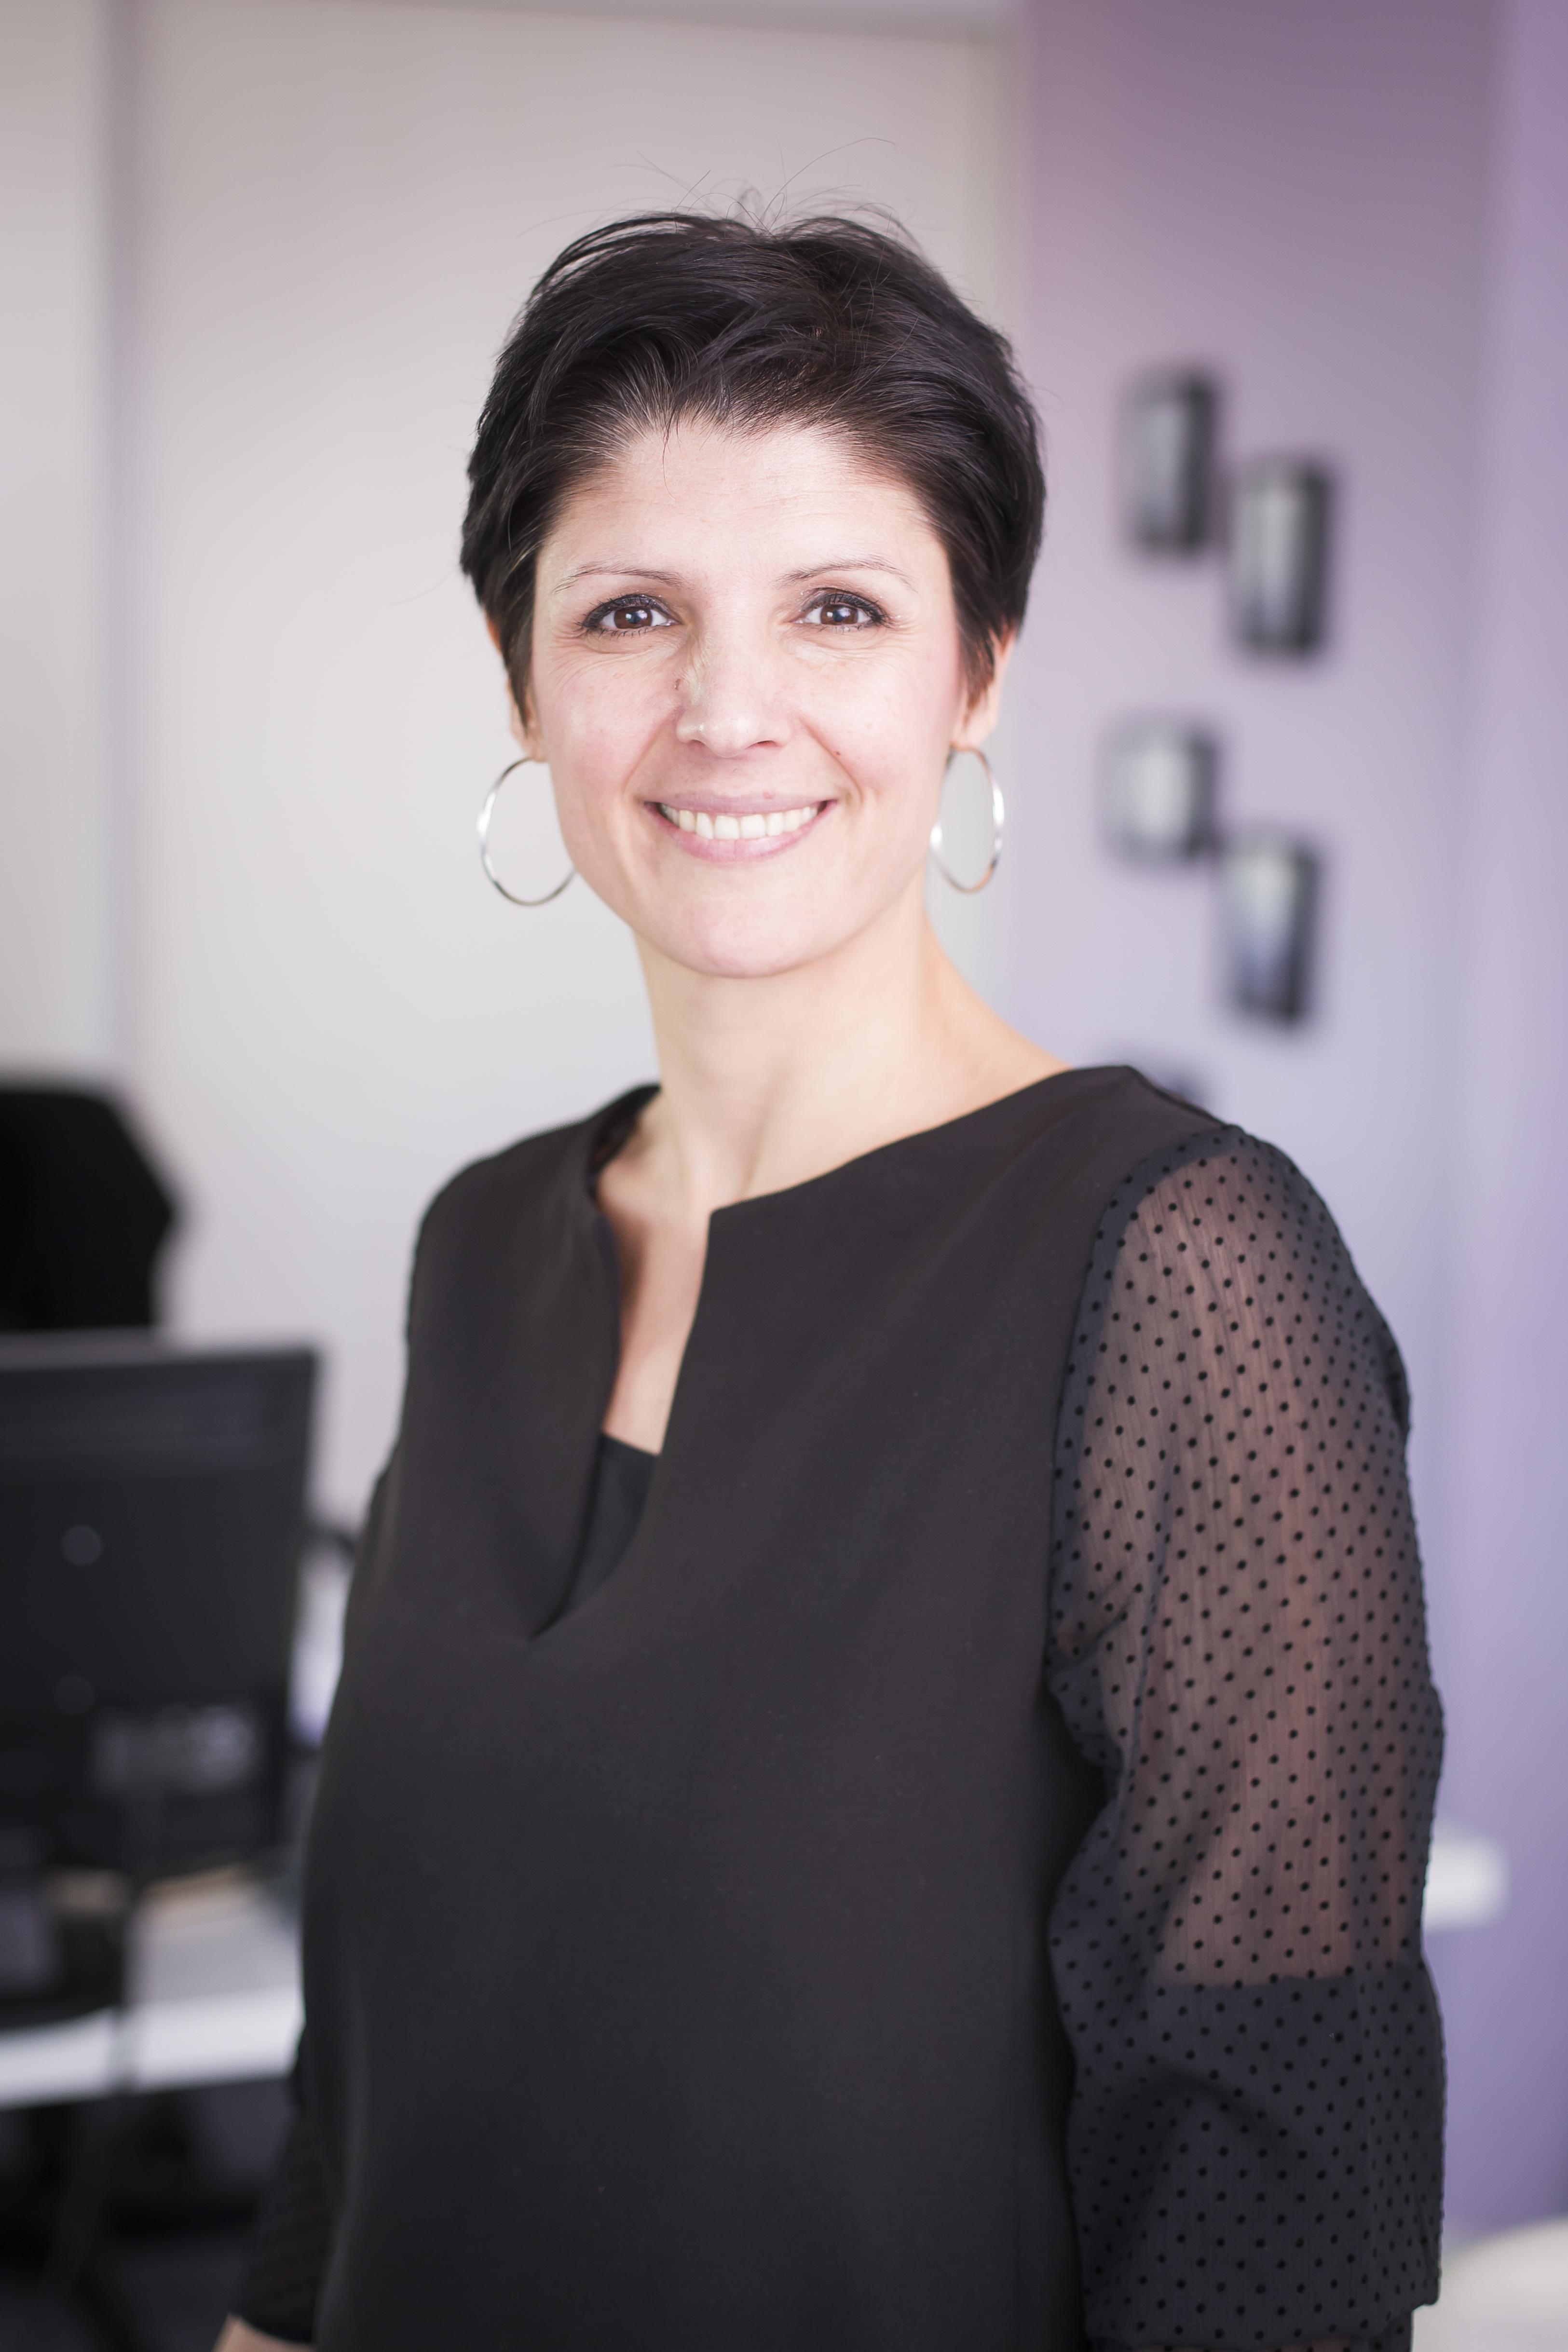 Carole Chovonziak